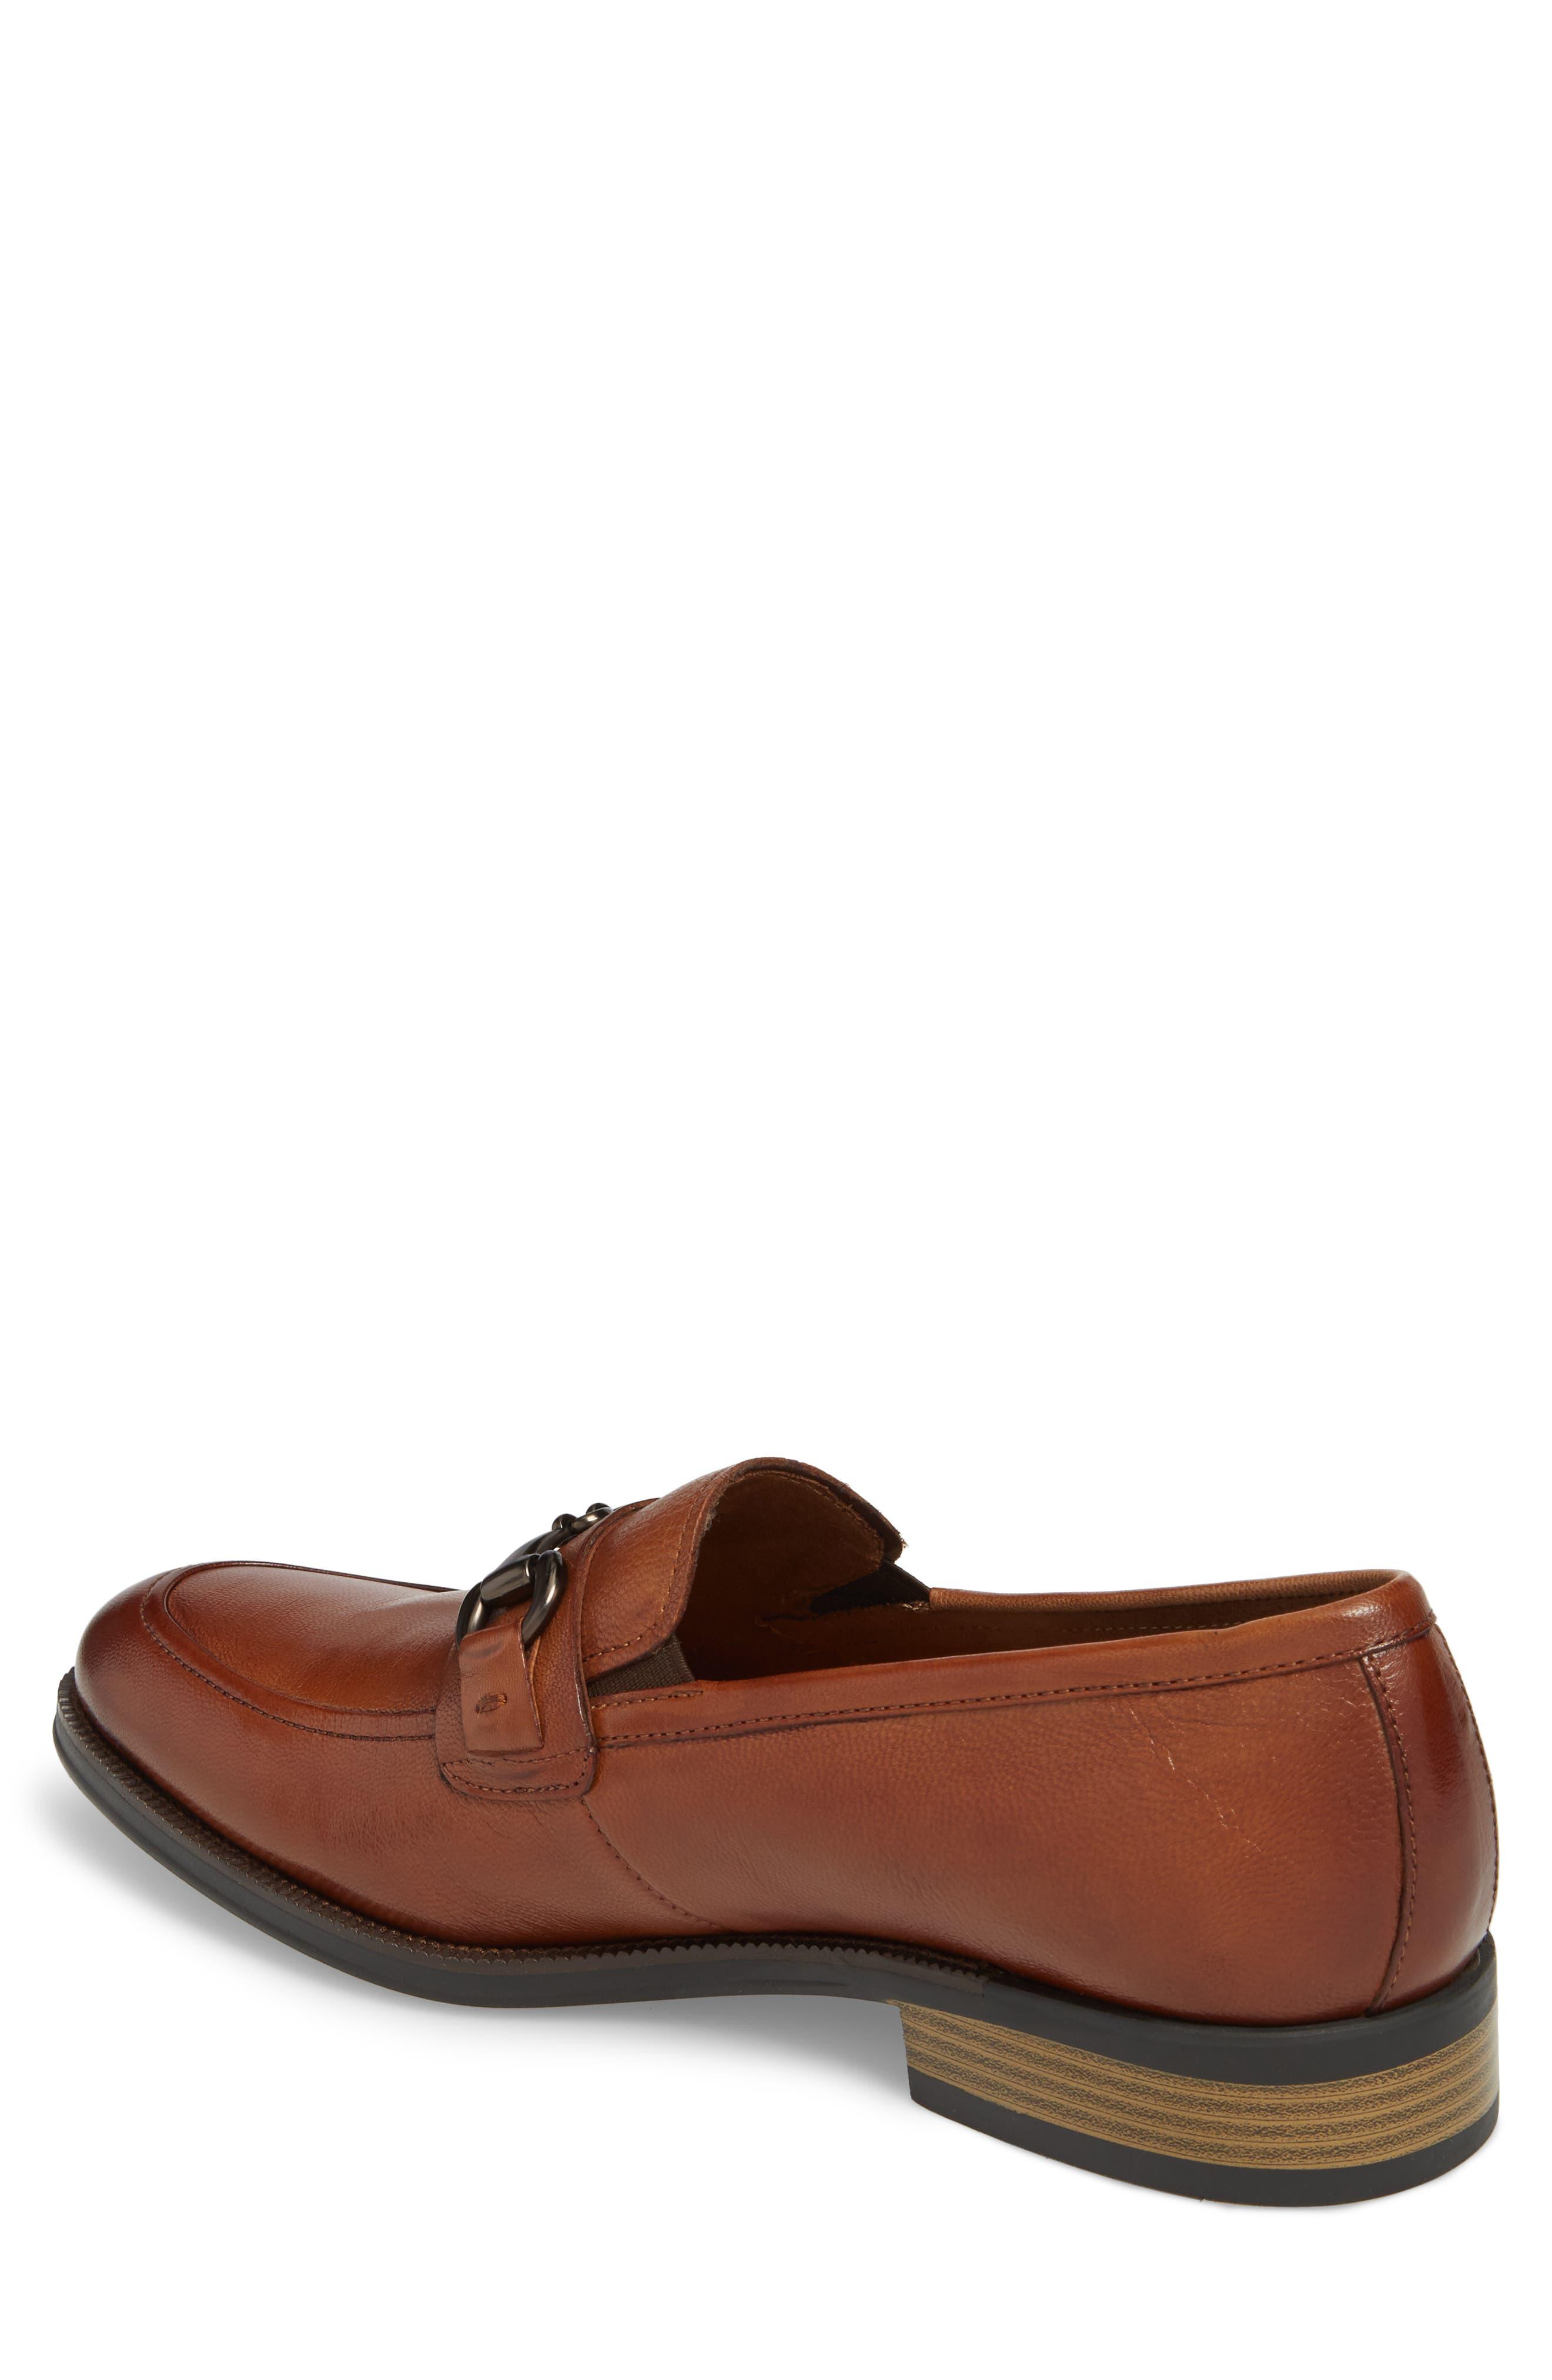 Brock Bit Loafer,                             Alternate thumbnail 2, color,                             Cognac Leather